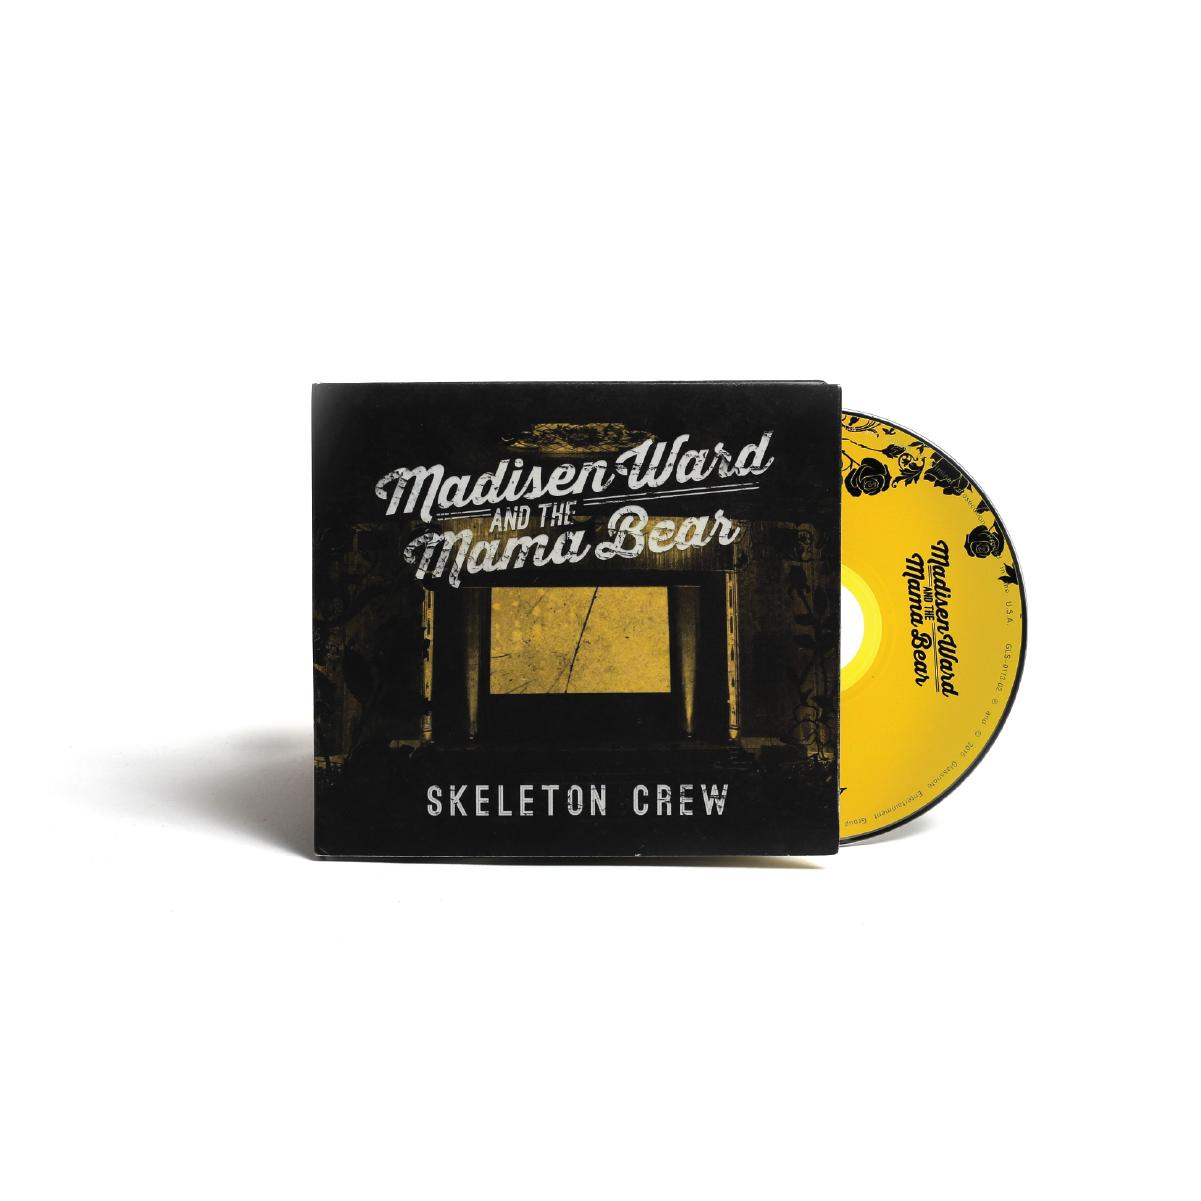 Skeleton Crew CD - Madisen Ward and the Mama Bear